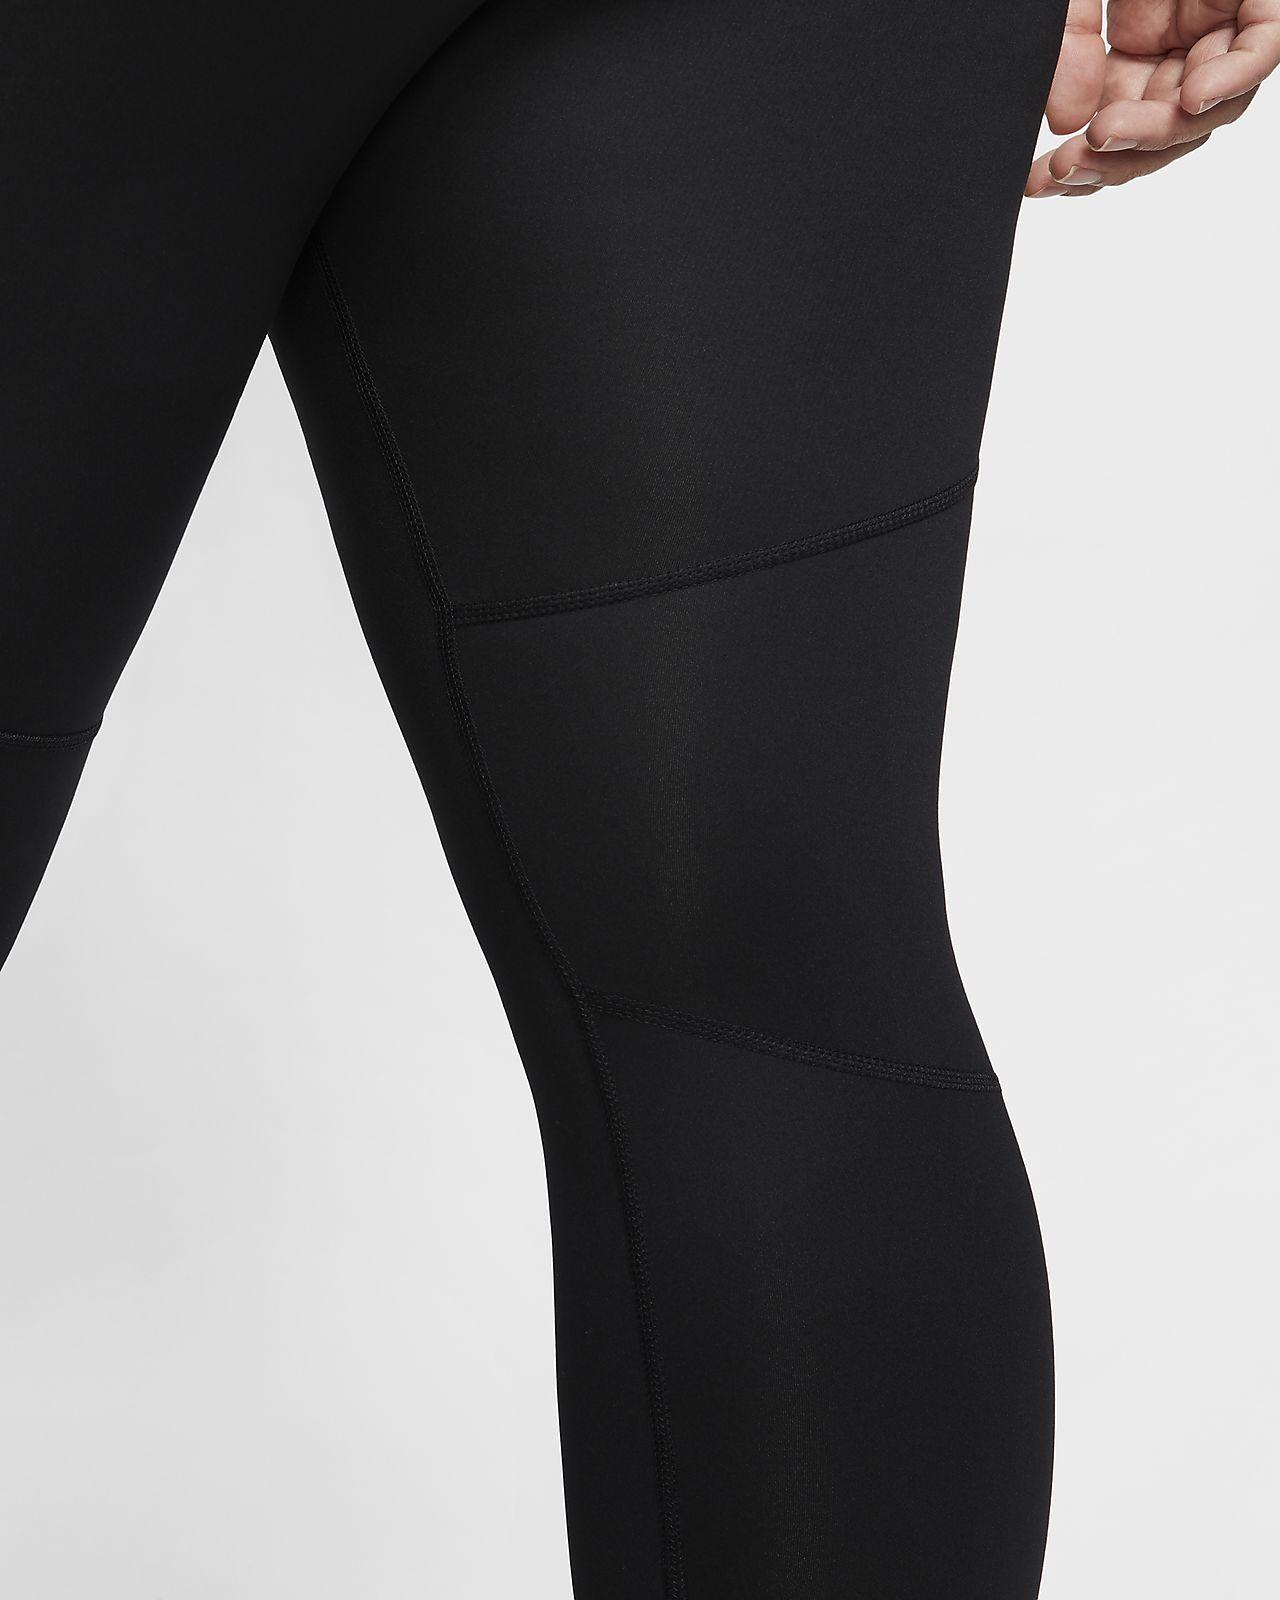 Nike Pro Warm Damen Tights (große Größe)